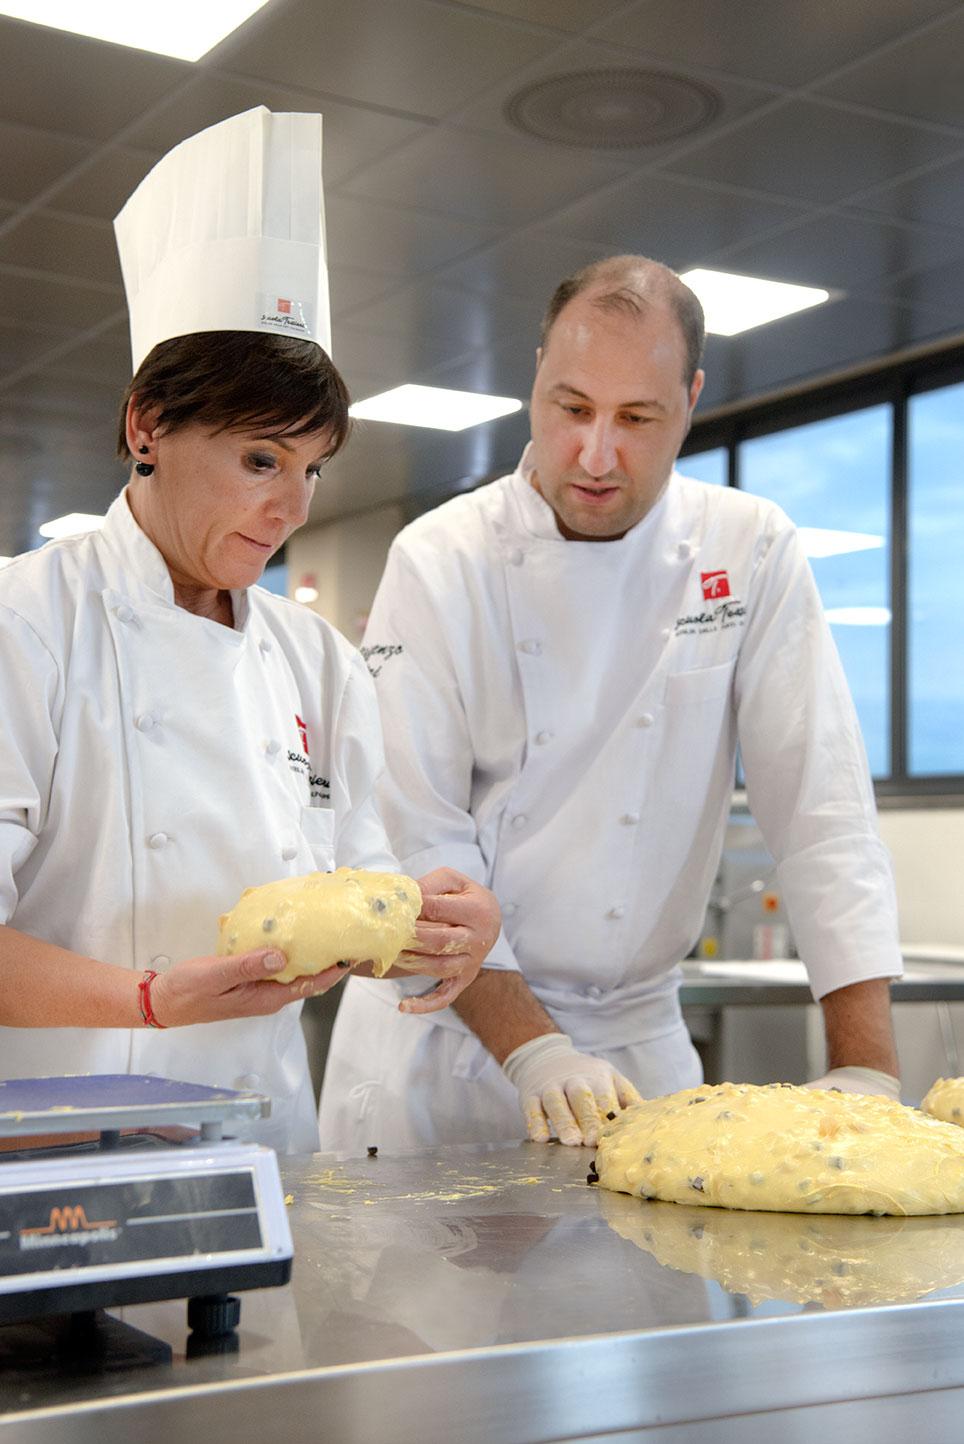 Scuola Tessieri: i nostri Corsi di Cucina, l'offerta completa